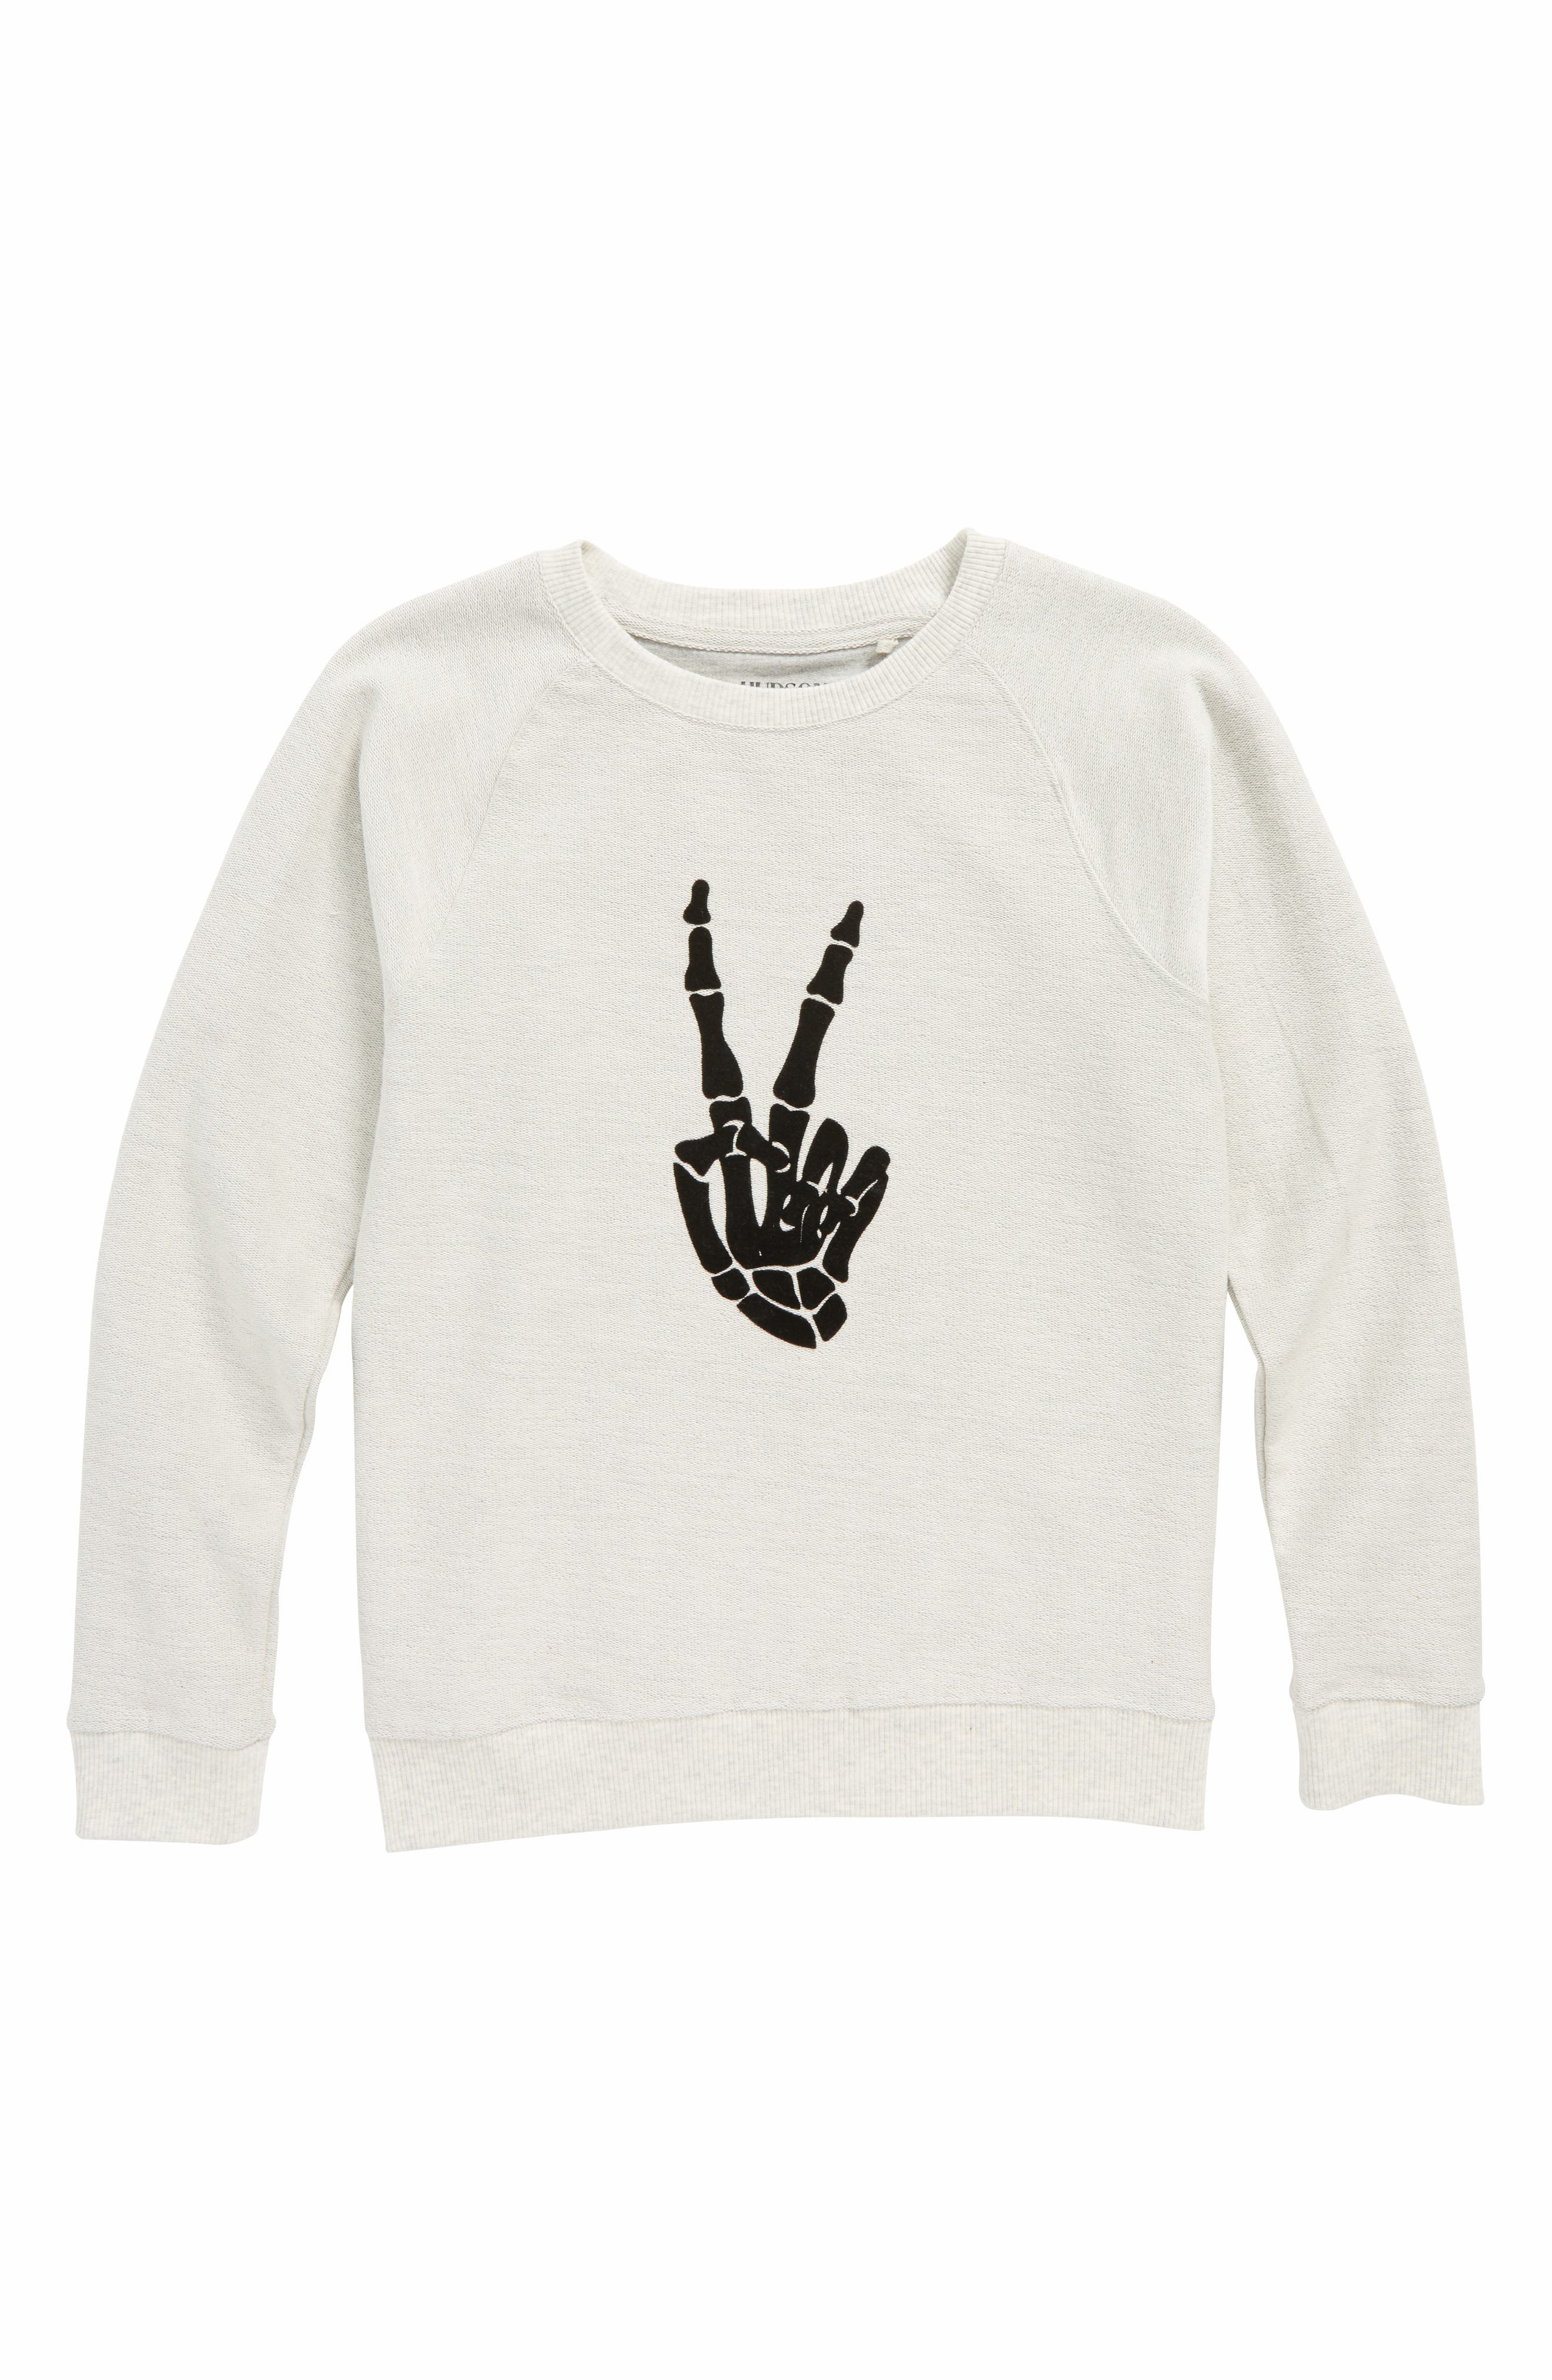 Main Image - Hudson Kids Vibes Graphic Sweatshirt (Baby Boys)